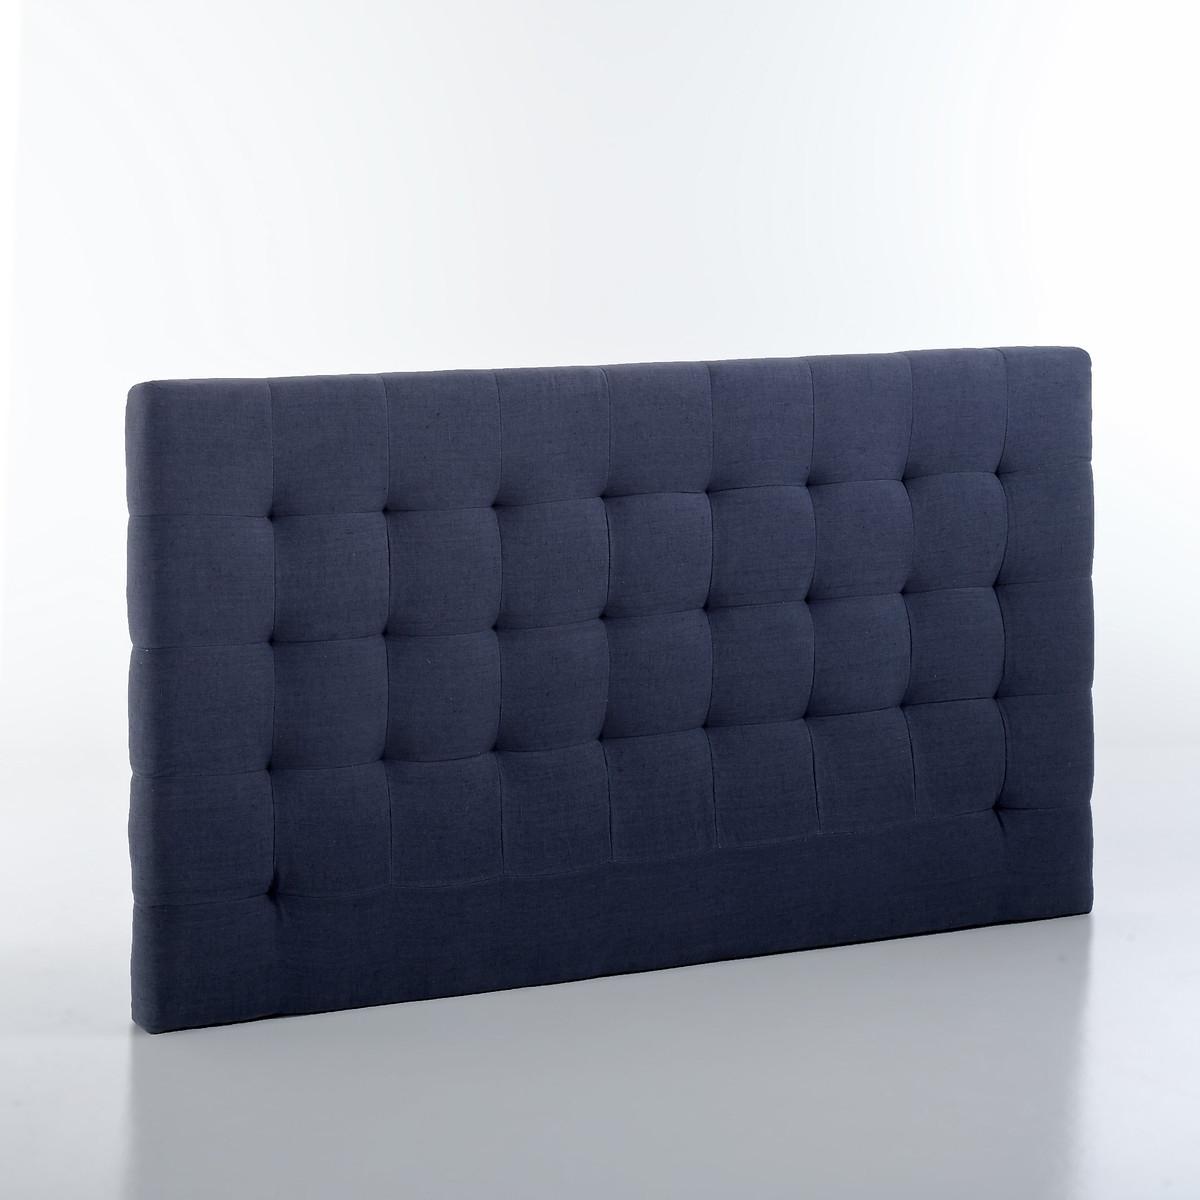 Изголовье LaRedoute Кровати мягкое Selve В 100 см 140 см синий кровати 160 см